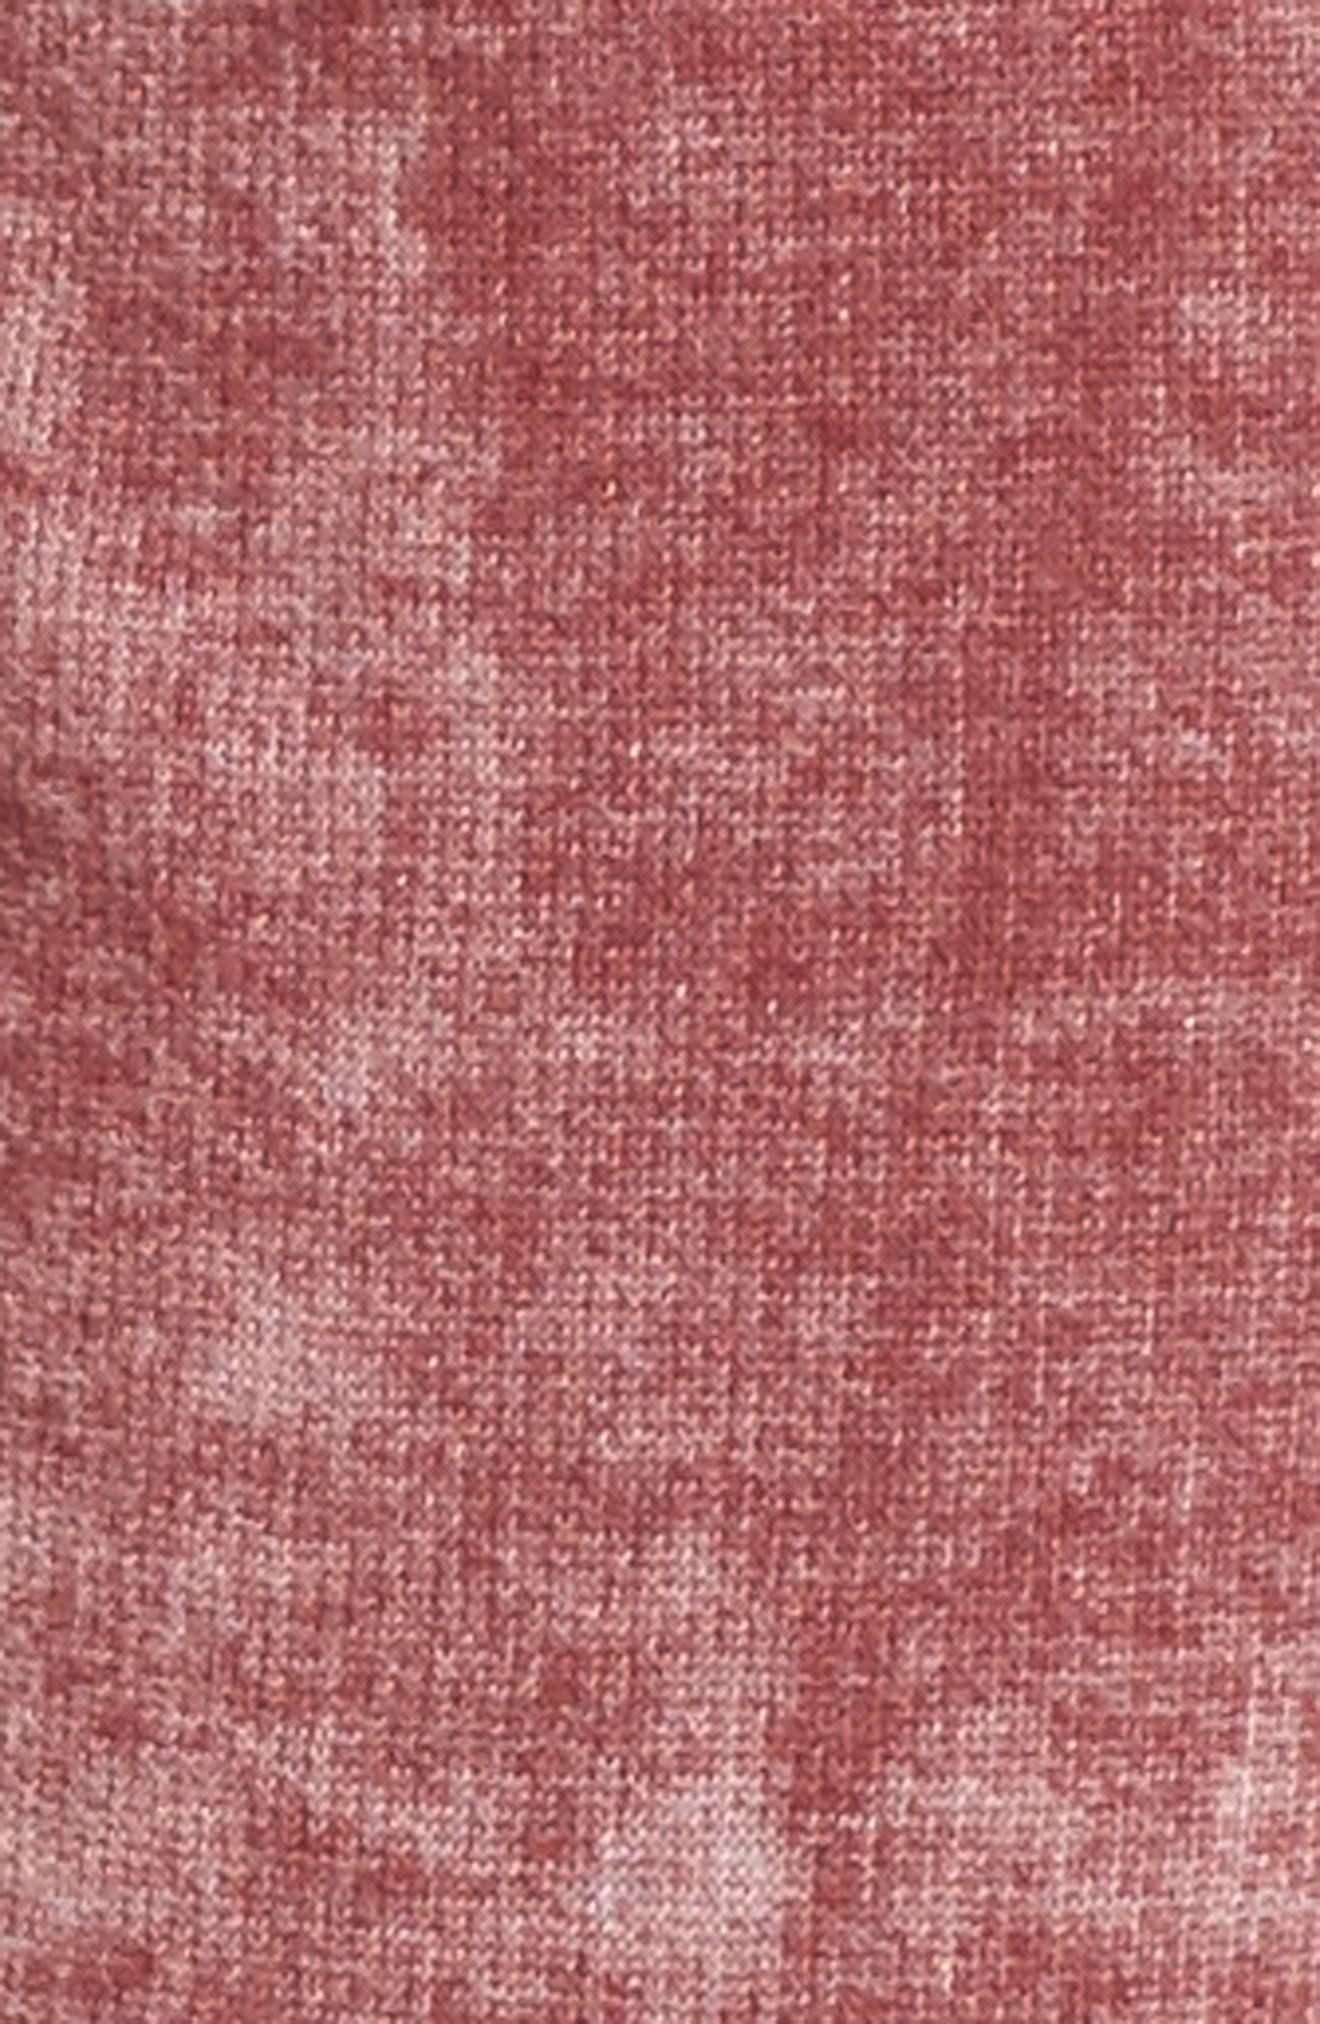 Grommet Detail Jogger Pants,                             Alternate thumbnail 5, color,                             Burgundy